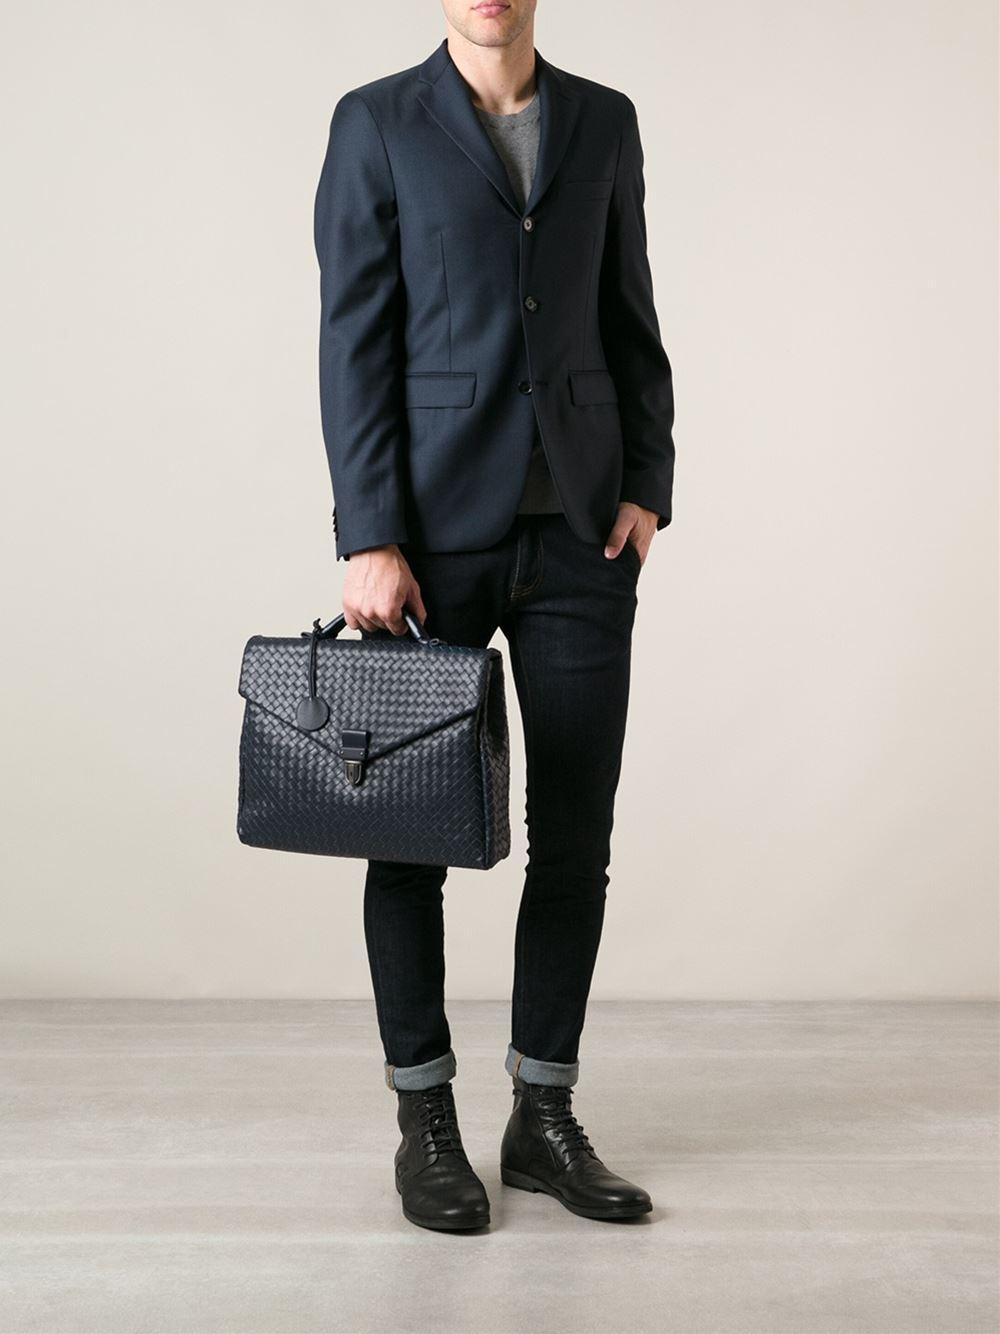 6649ed15fb3f Bottega Veneta Intrecciato Briefcase in Blue for Men - Lyst